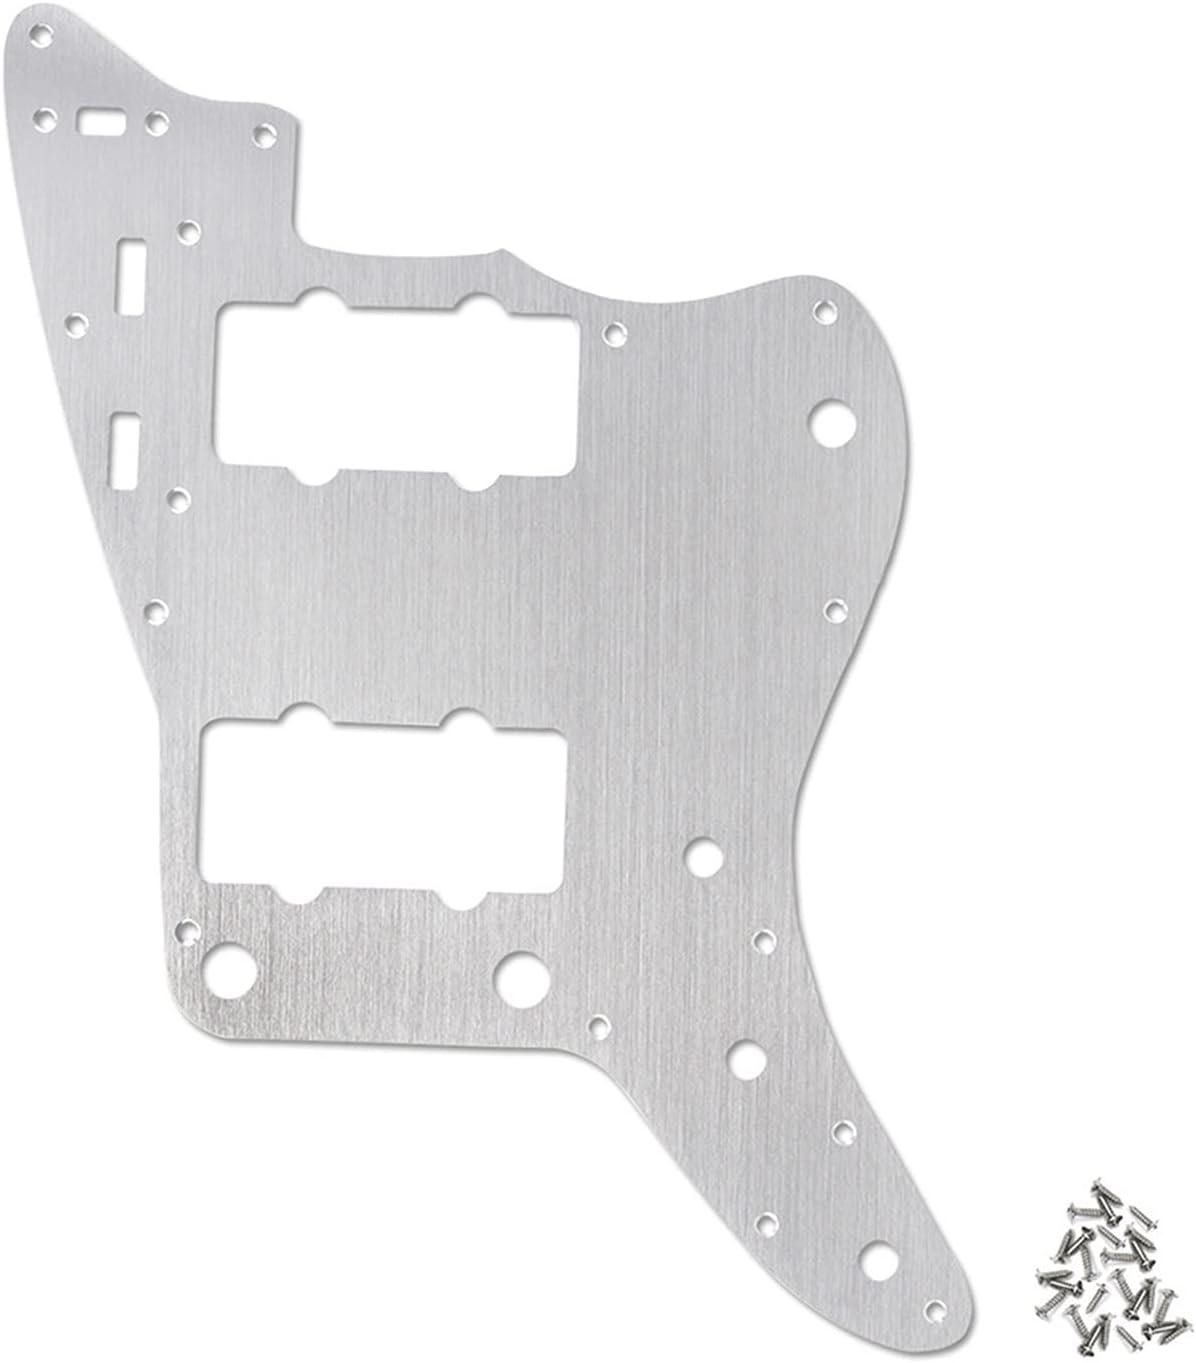 HUAHUA JUSU Store Guitarra eléctrica PickGuard Backplate Fit de 13 Orificios para estándar Americano JM Accesorios de Guitarra de Plata de Guitarra de jazzMaster (Color : Silver)